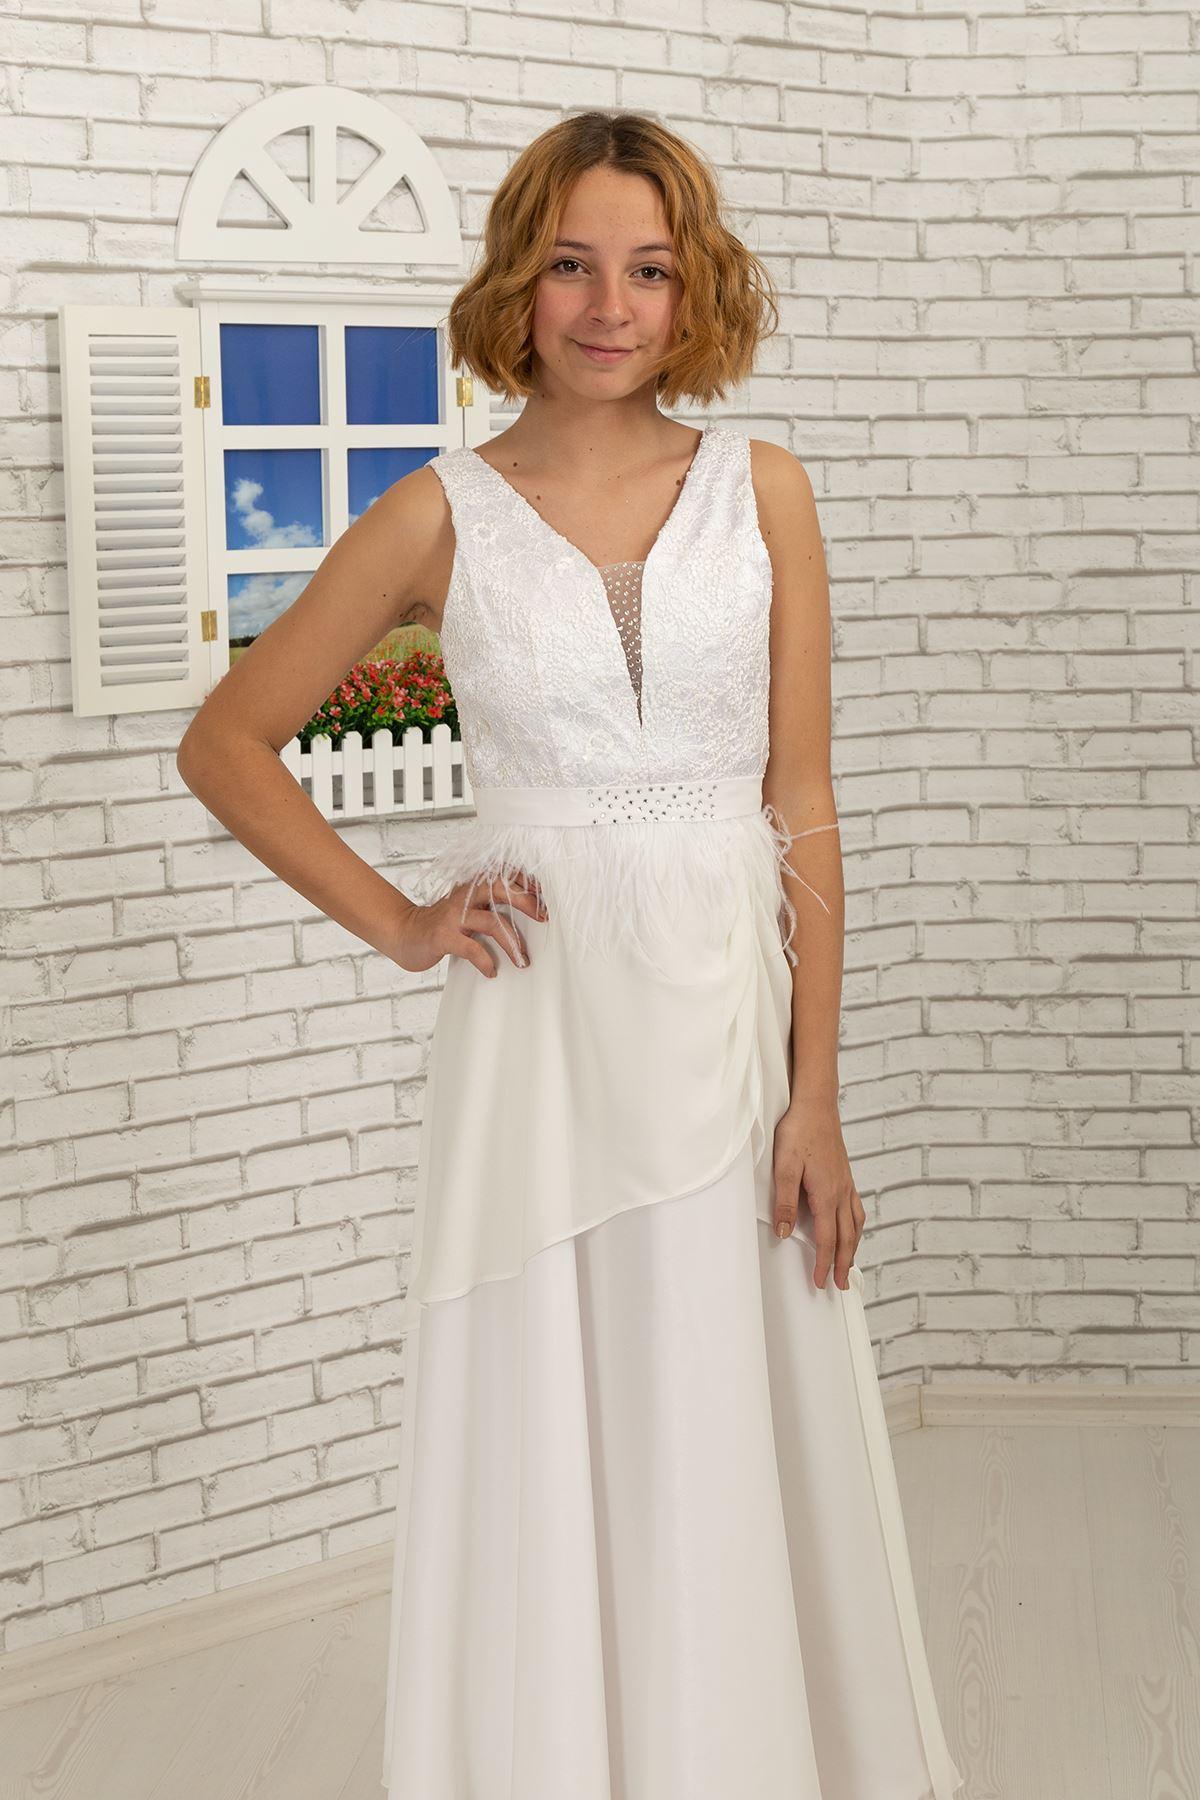 Body lace coated, skirt detailed chiffon girl children evening dress 494 cream